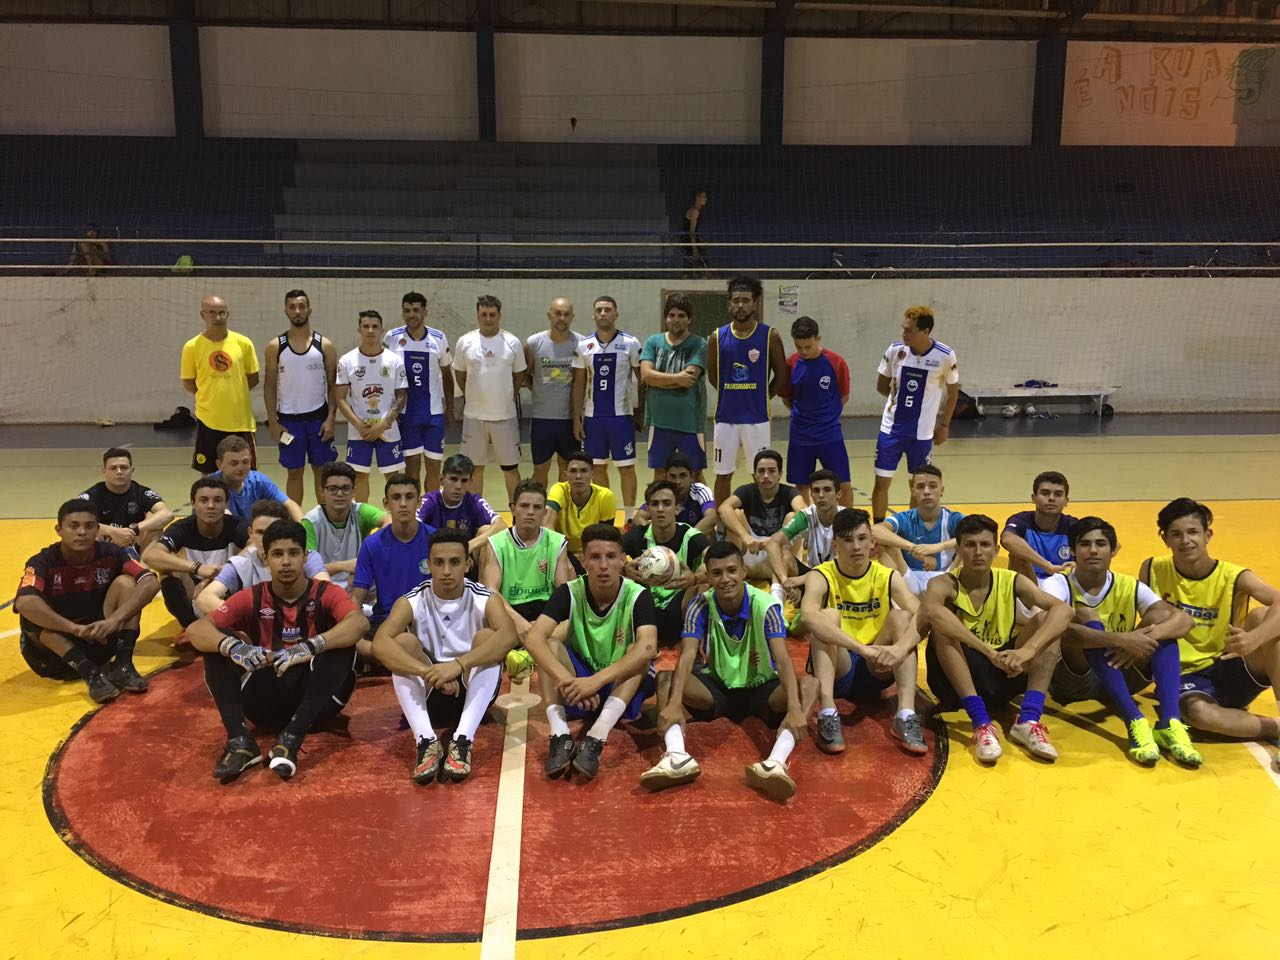 Prefeitura de Itararé (SP) abre seletiva para jogadores de Futsal